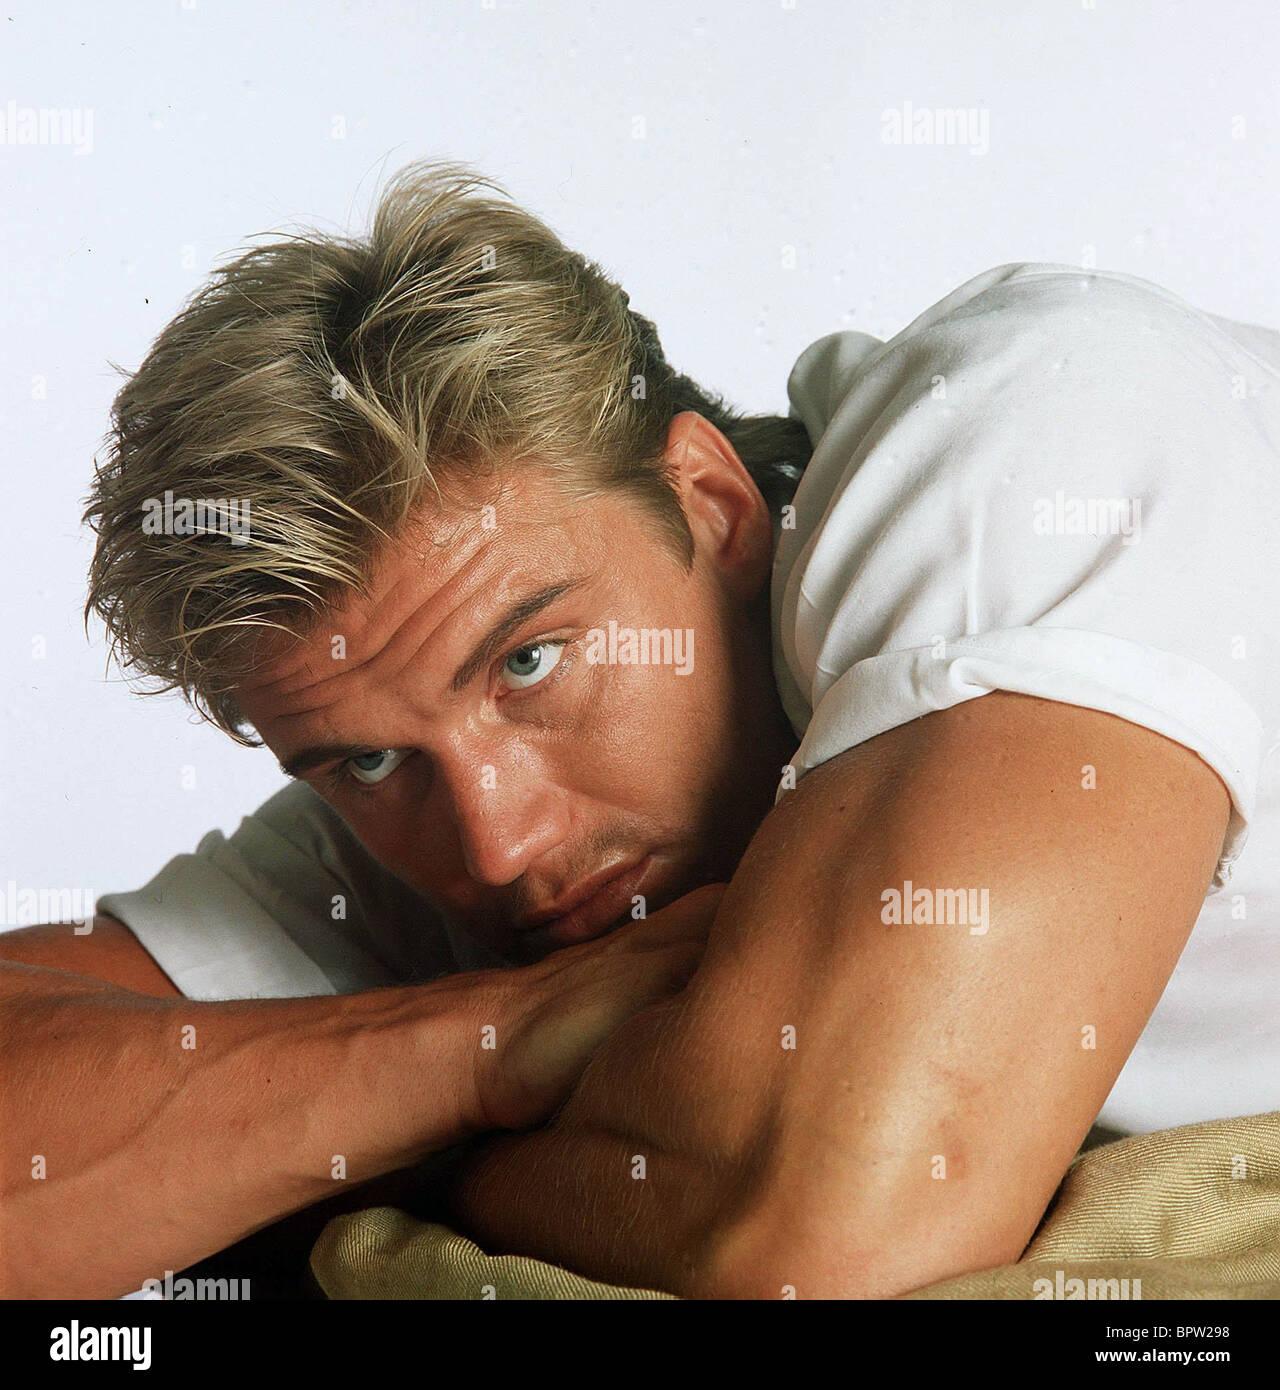 DOLPH LUNDGREN ACTOR (1987) - Stock Image